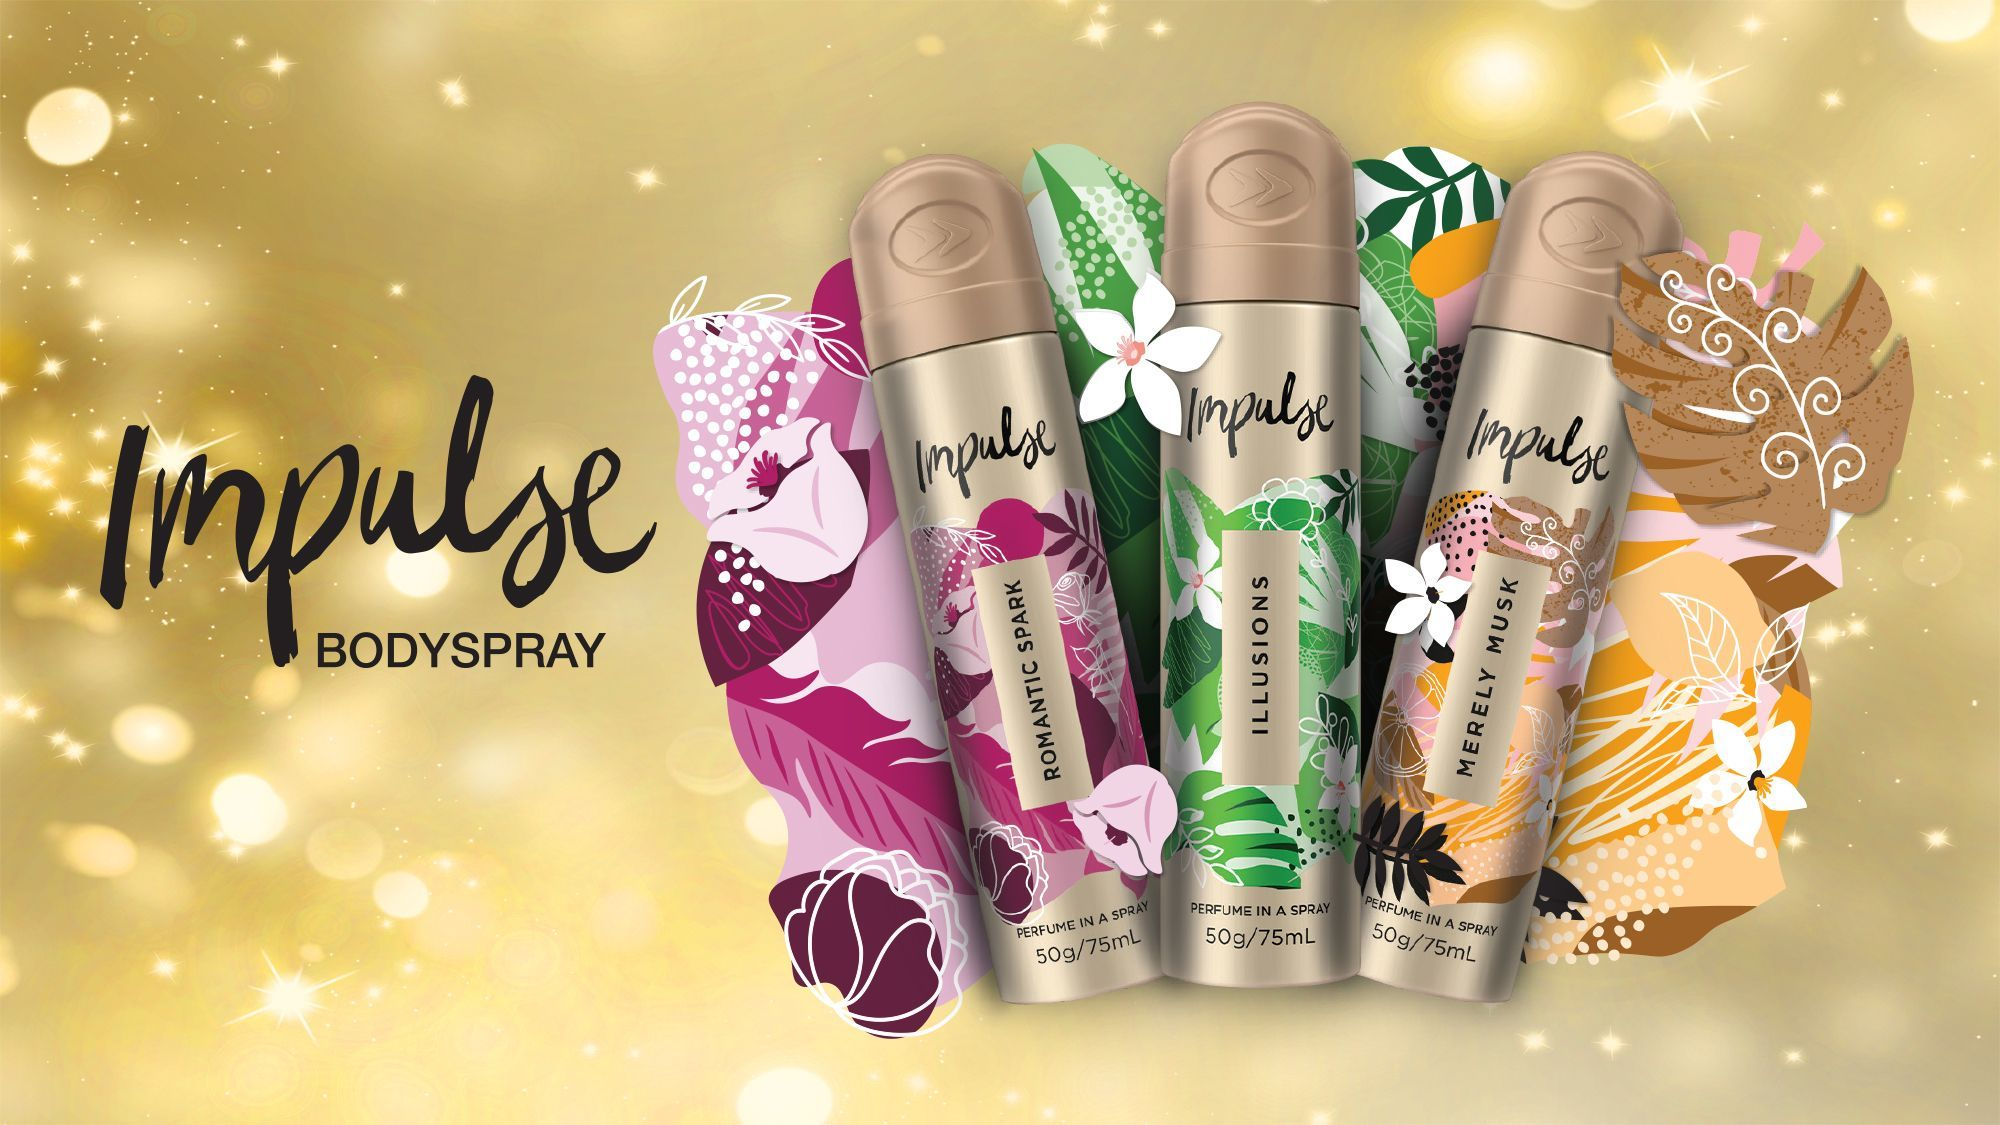 Impulse body spray range